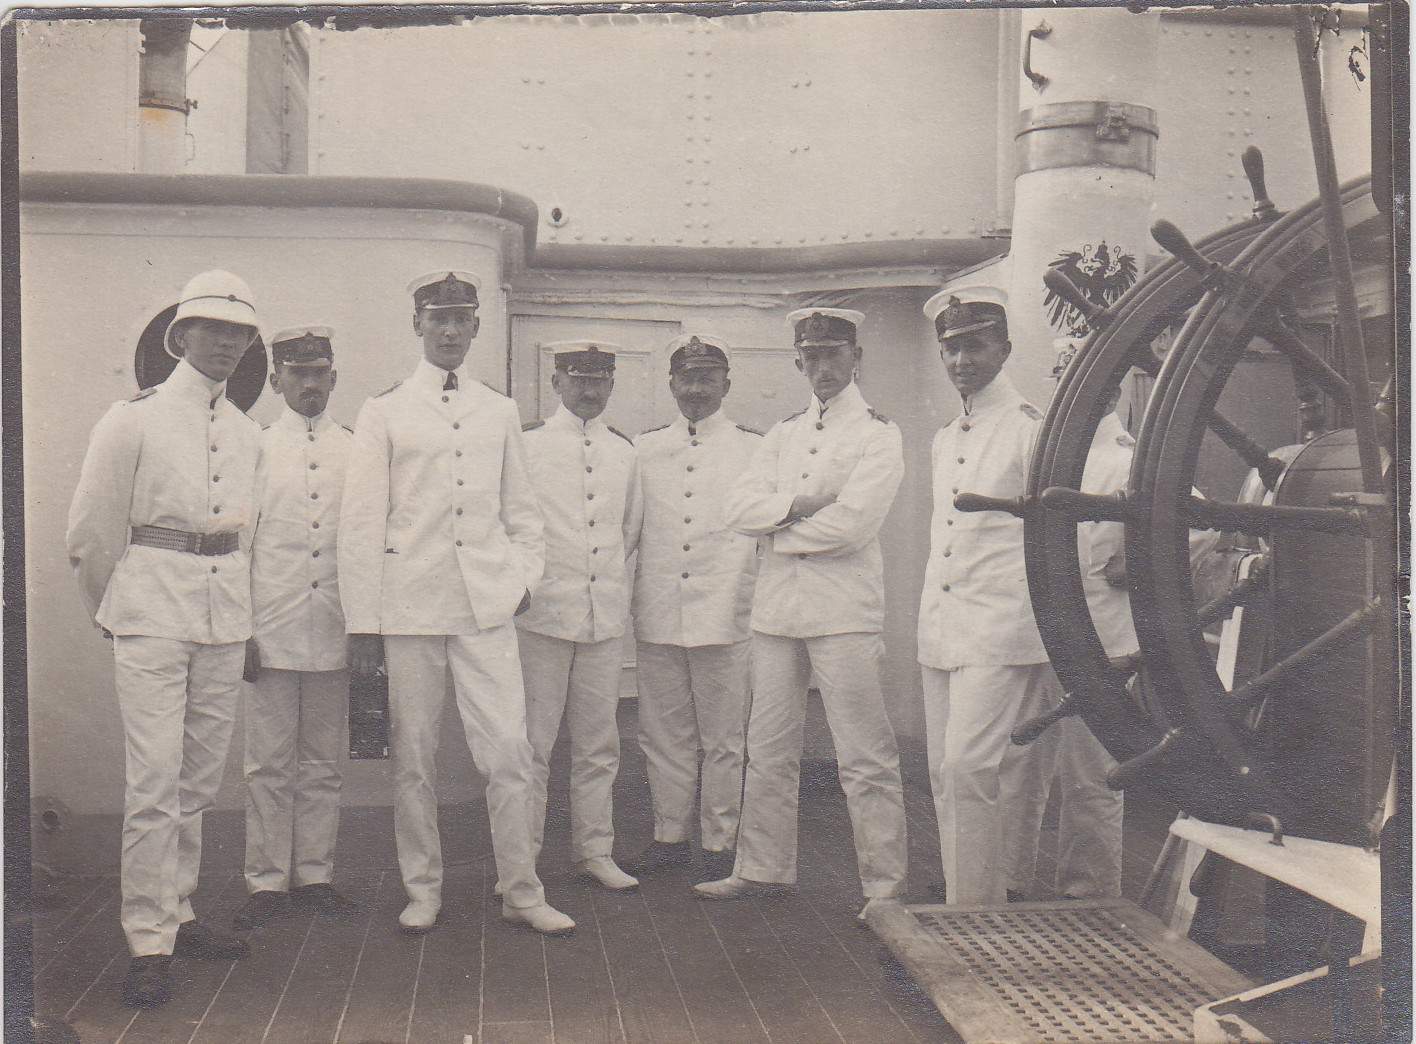 Offizierkorps von links nach rechts: Oberleutnant Ney, Kptl. Nittke (1. Offizier), Ltn. Gärtner, Stabsarzt Dr. Medow, Ob-Ing. Wolf, Obl. Kuno, Obl. Rave, Ob-Zahlm. Braukhoff